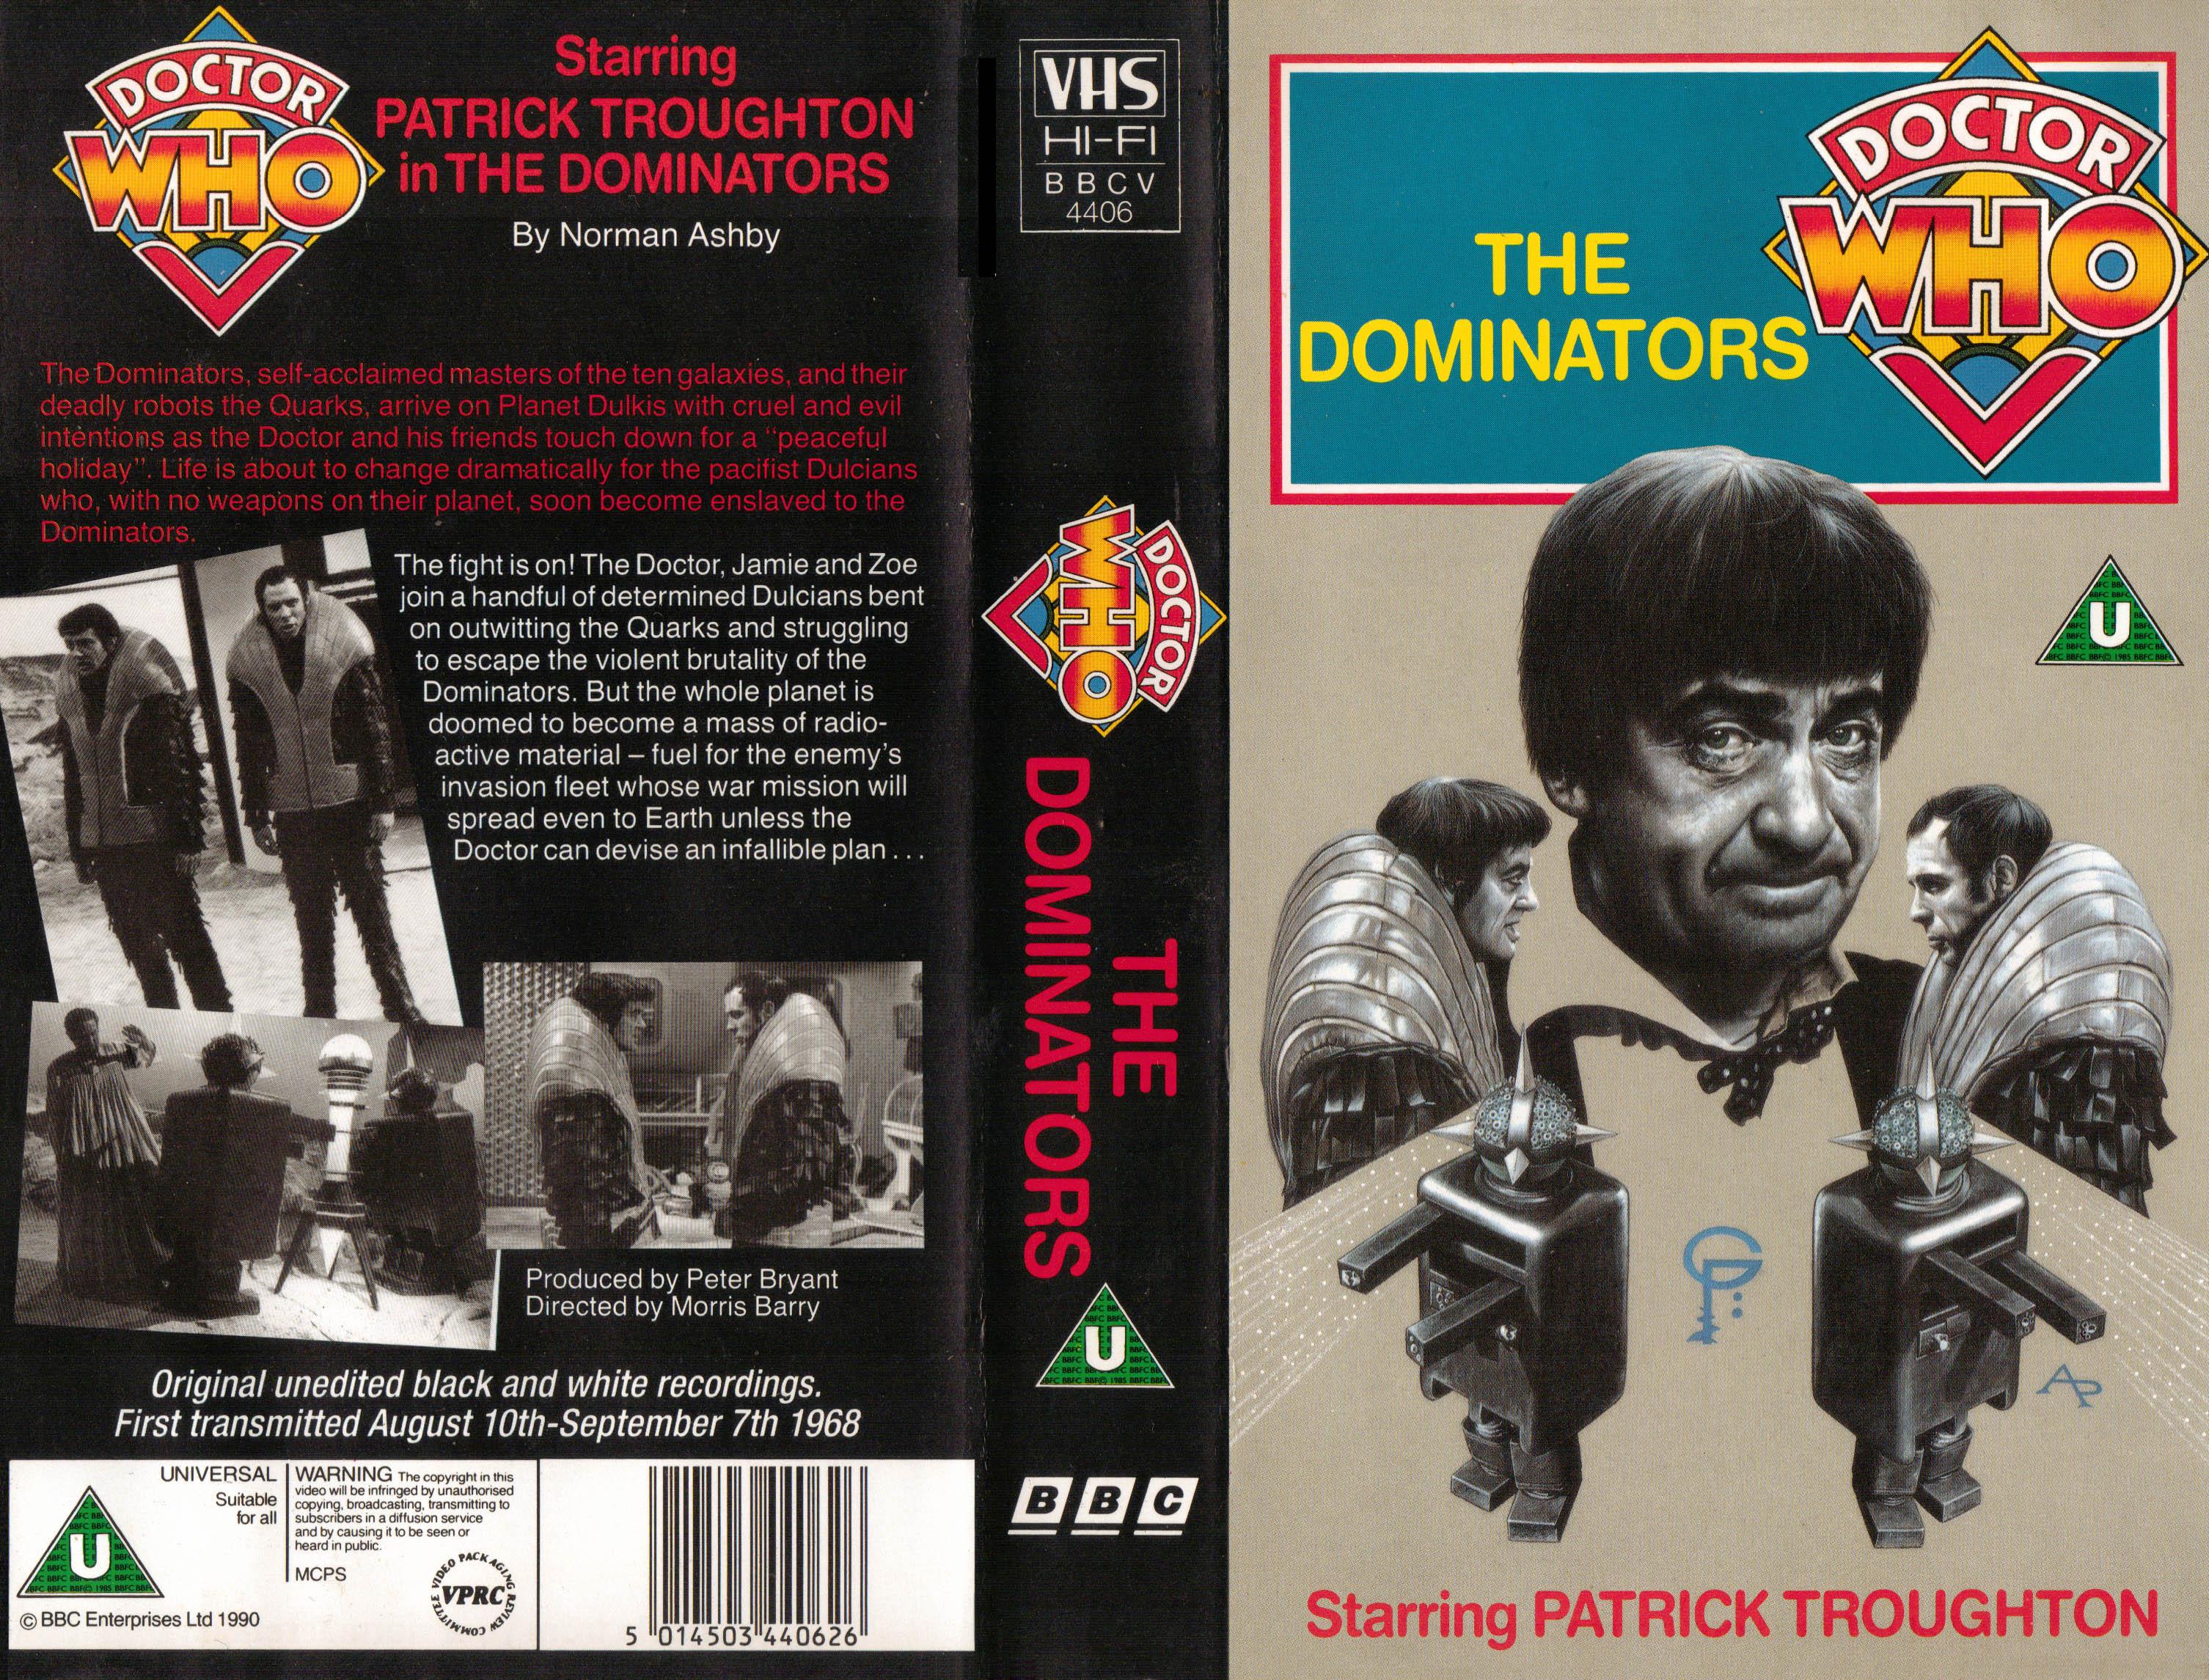 The Dominators